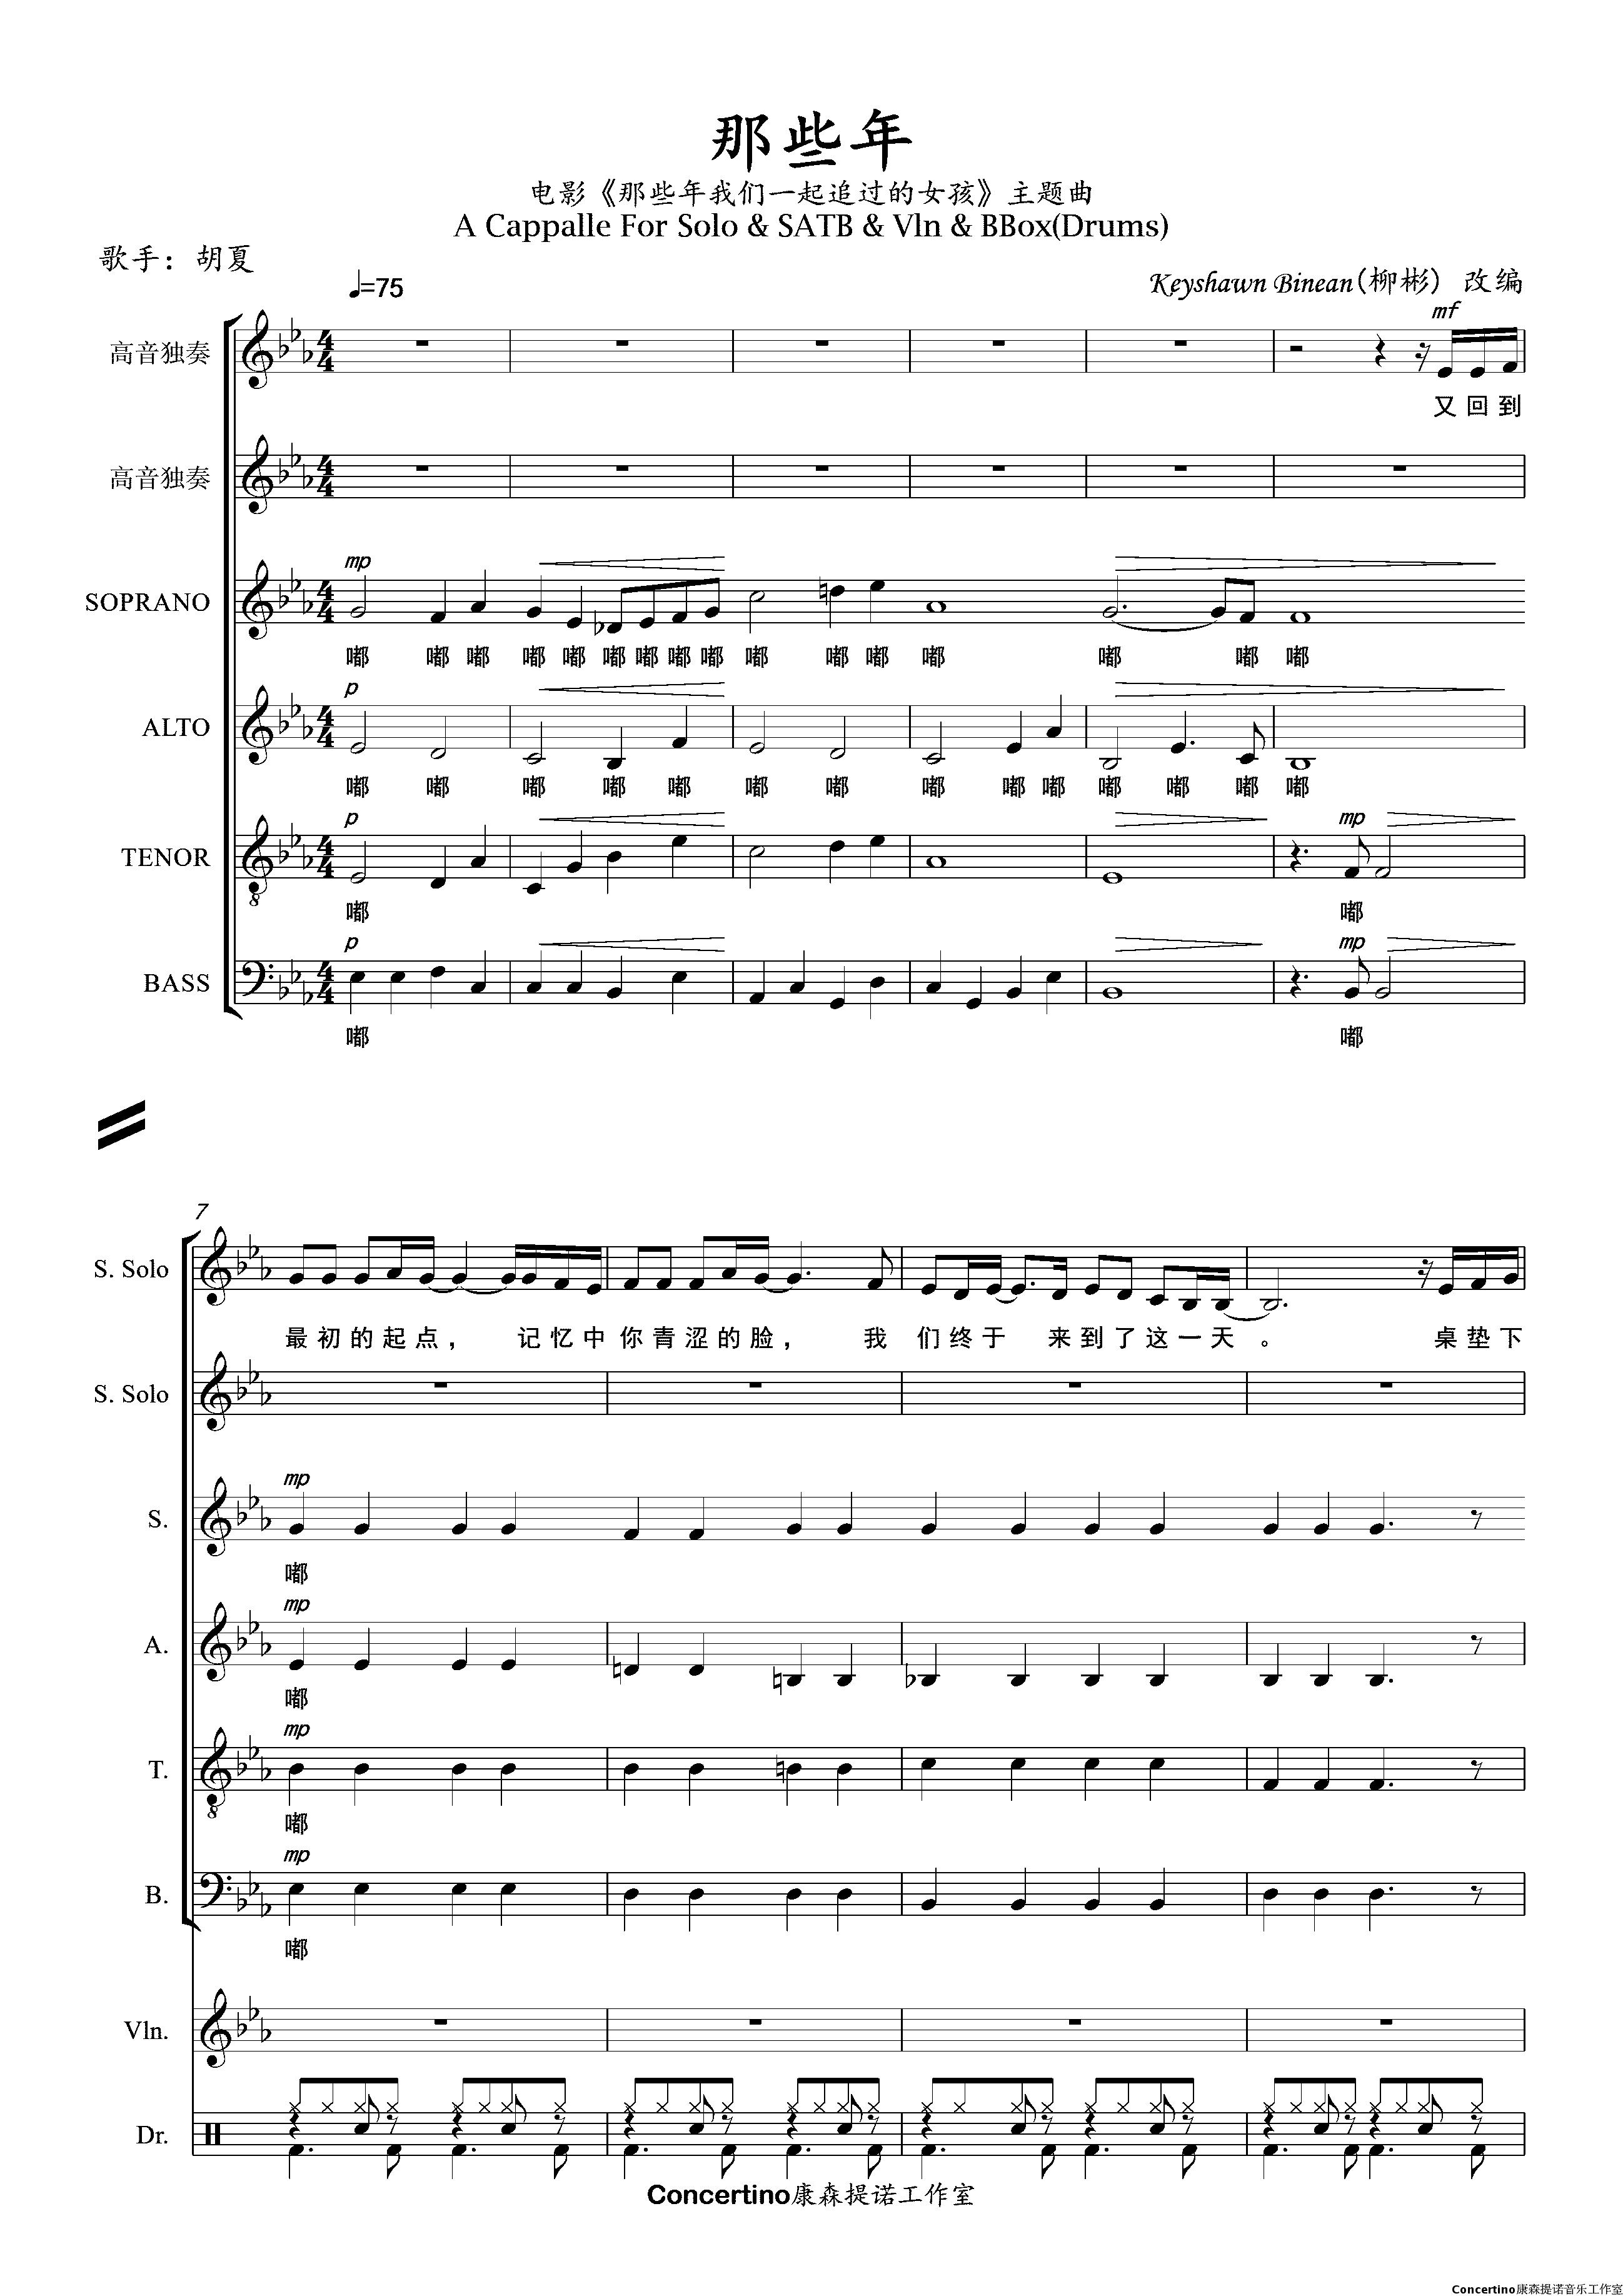 《那些年》阿卡贝拉合唱谱t-solo t-solo satb v b-box附送总音轨